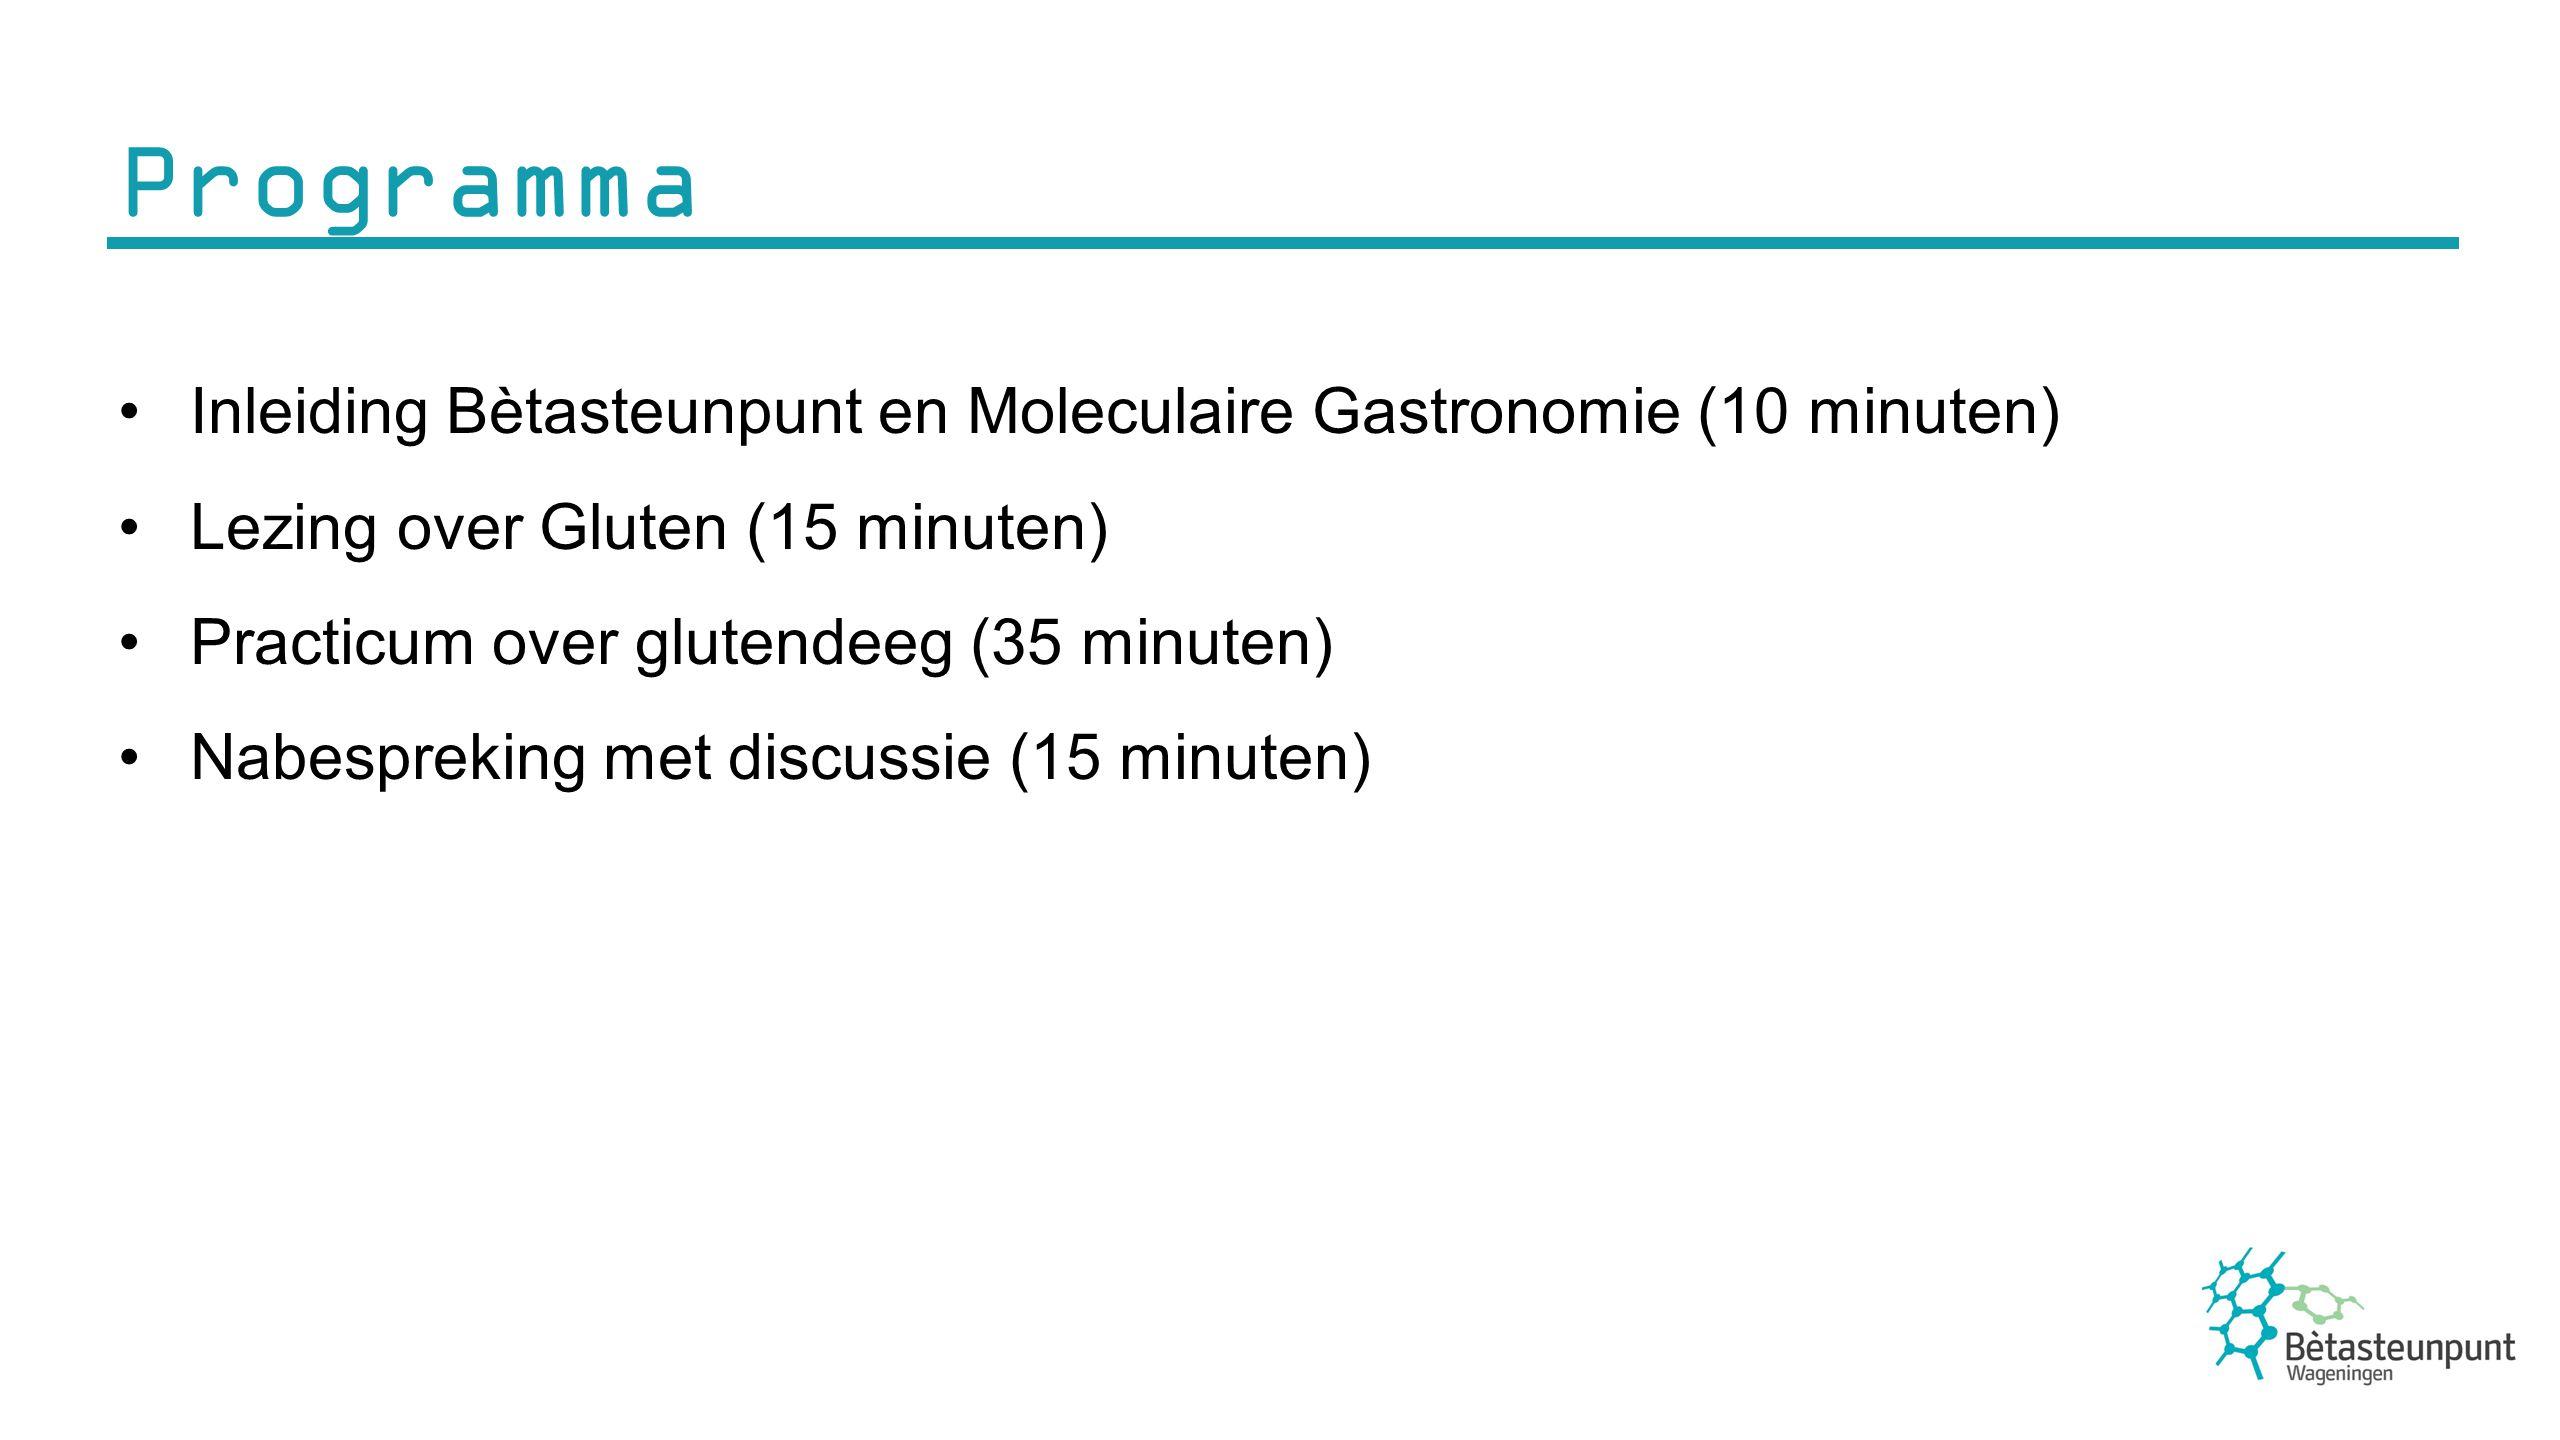 Programma Inleiding Bètasteunpunt en Moleculaire Gastronomie (10 minuten) Lezing over Gluten (15 minuten) Practicum over glutendeeg (35 minuten) Nabes